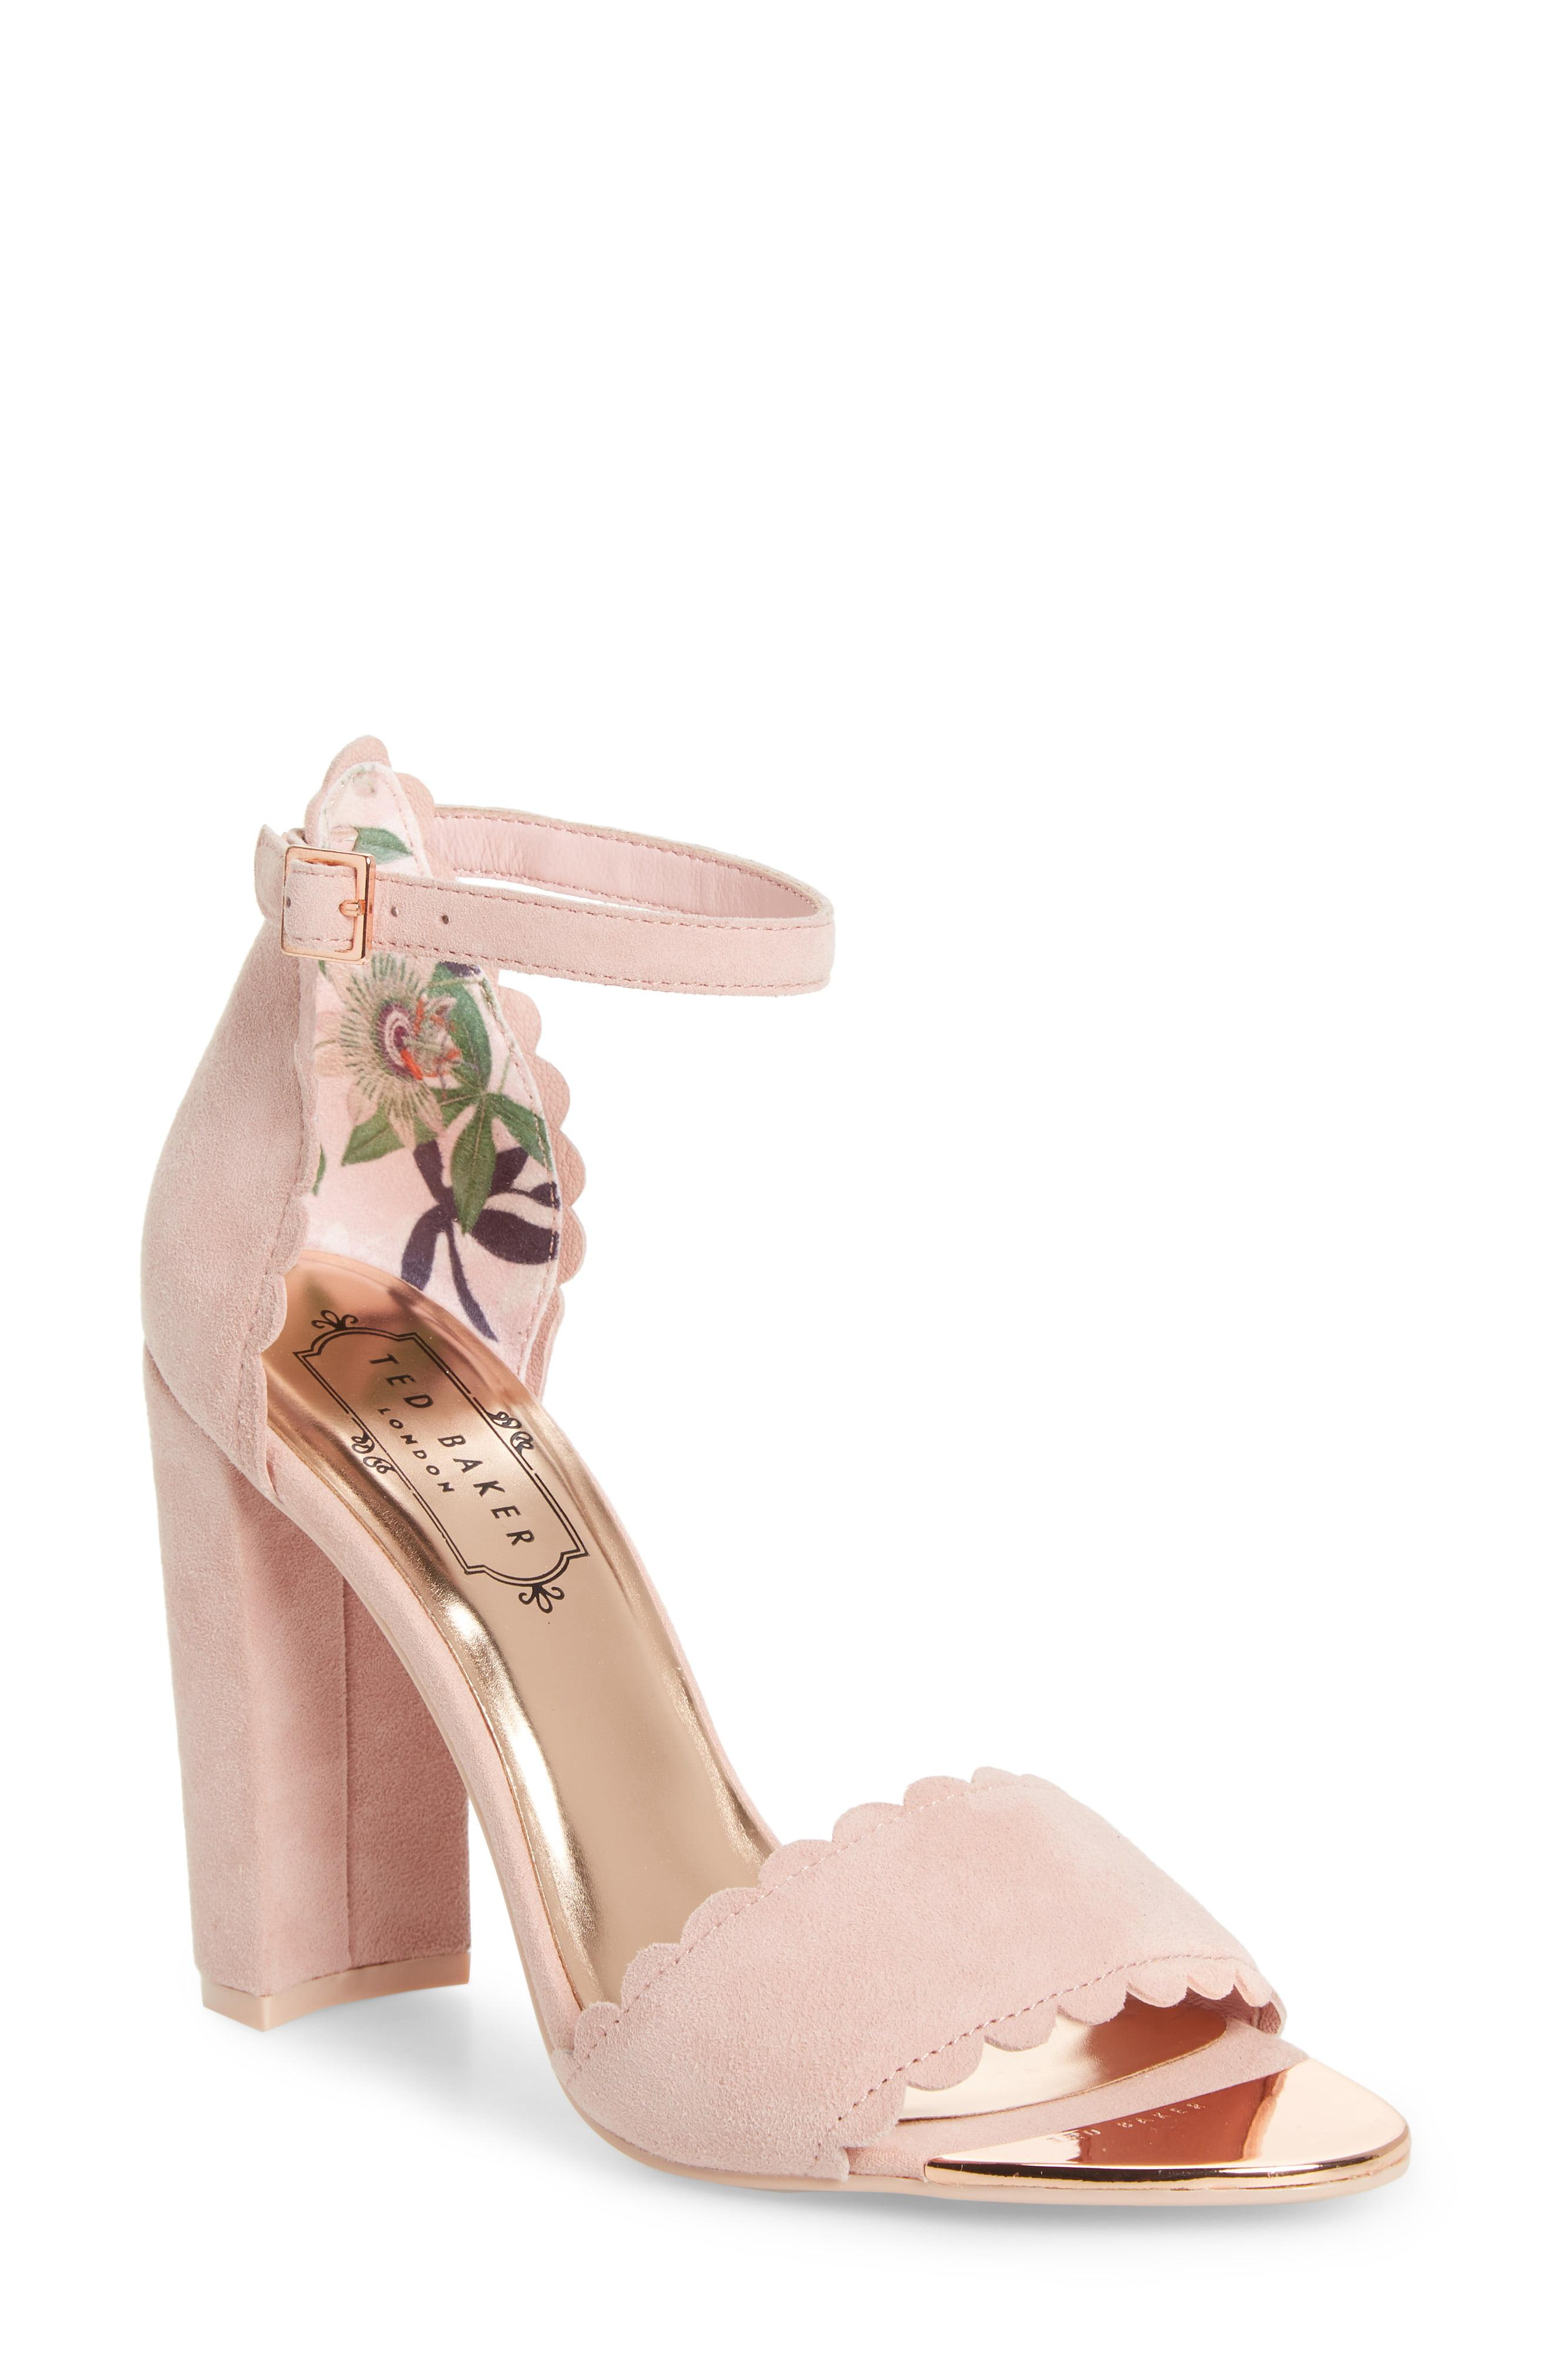 277d3c7b3 Lyst - Ted Baker Raidha Sandal in Pink